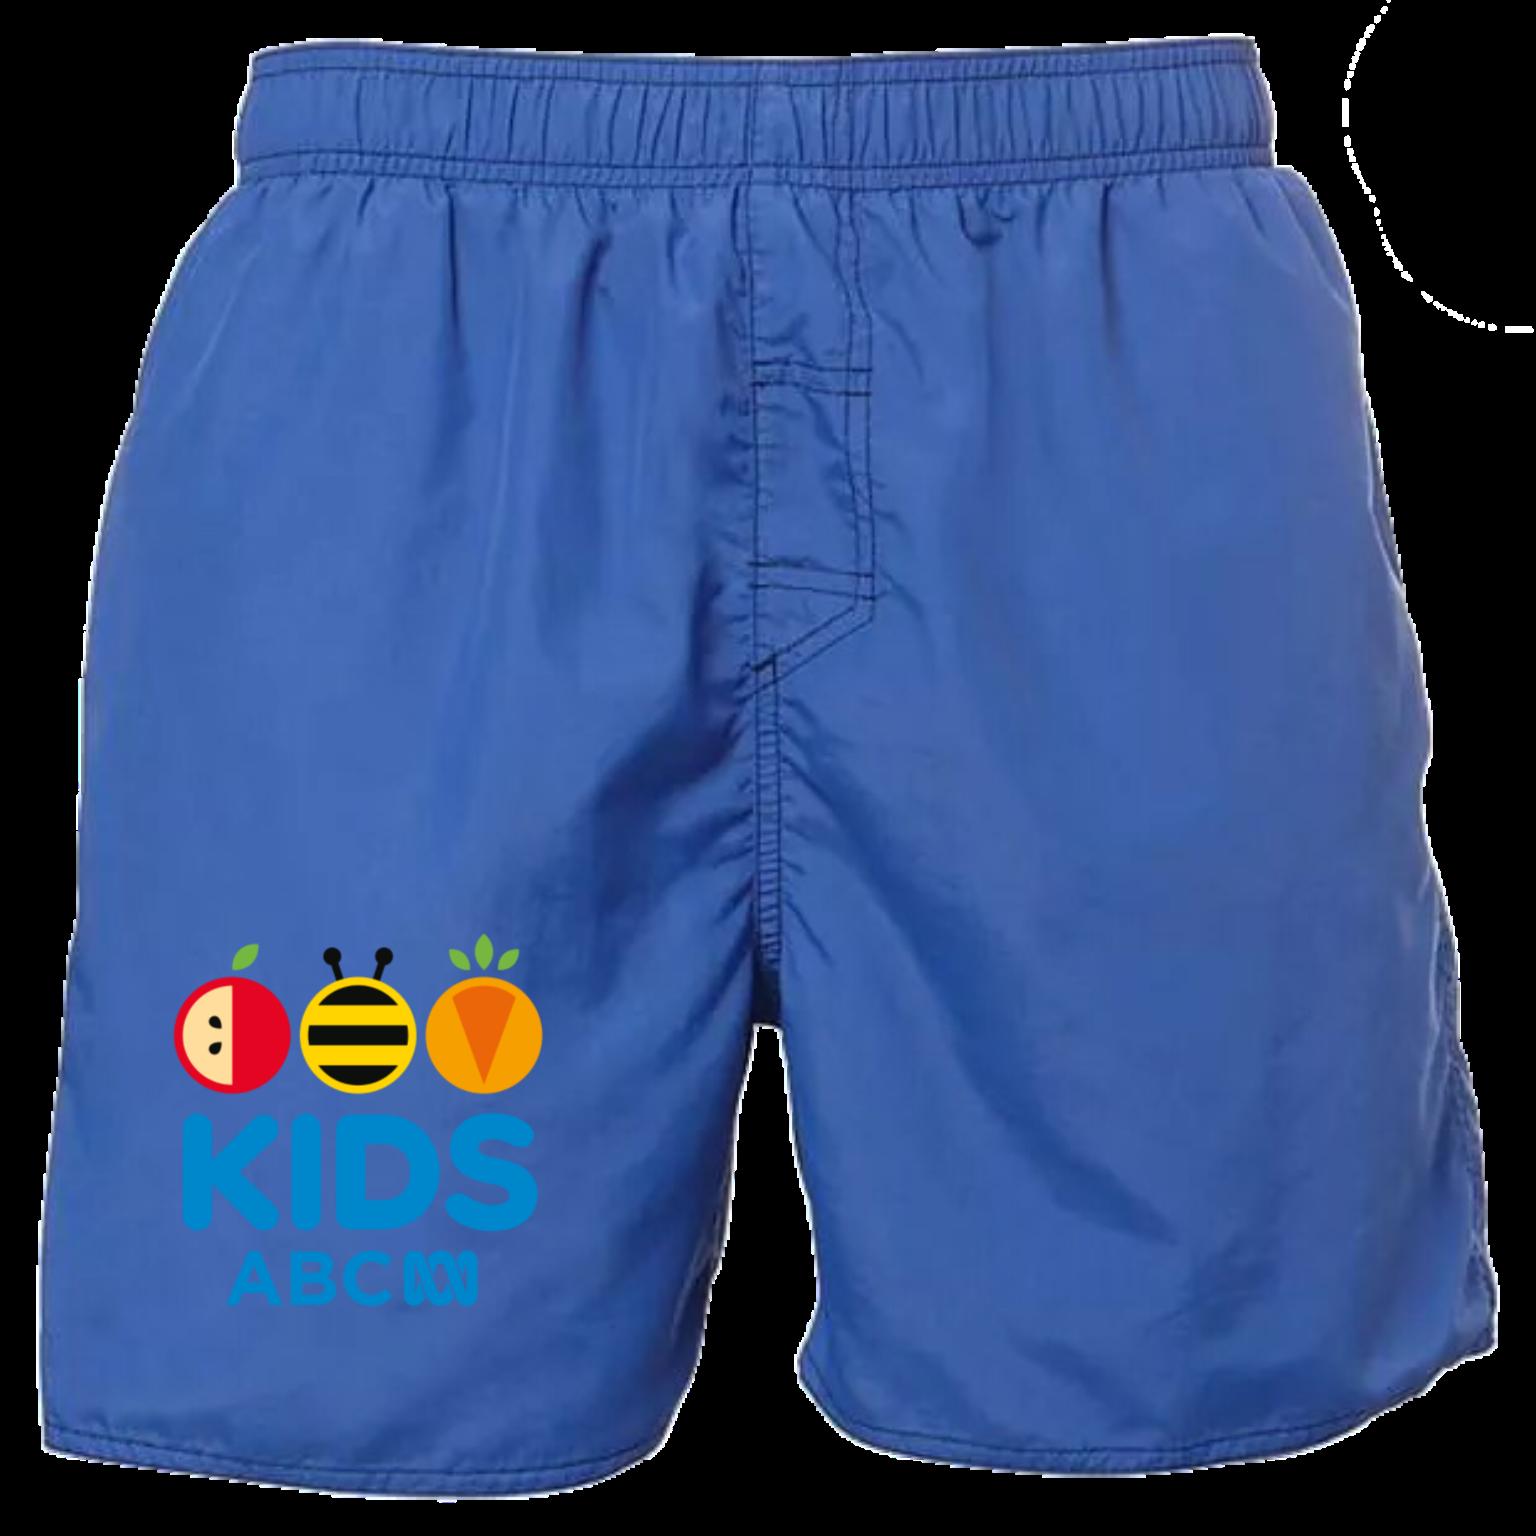 ABC Kids Men's Swim Shorts Royal Blue Size M.png